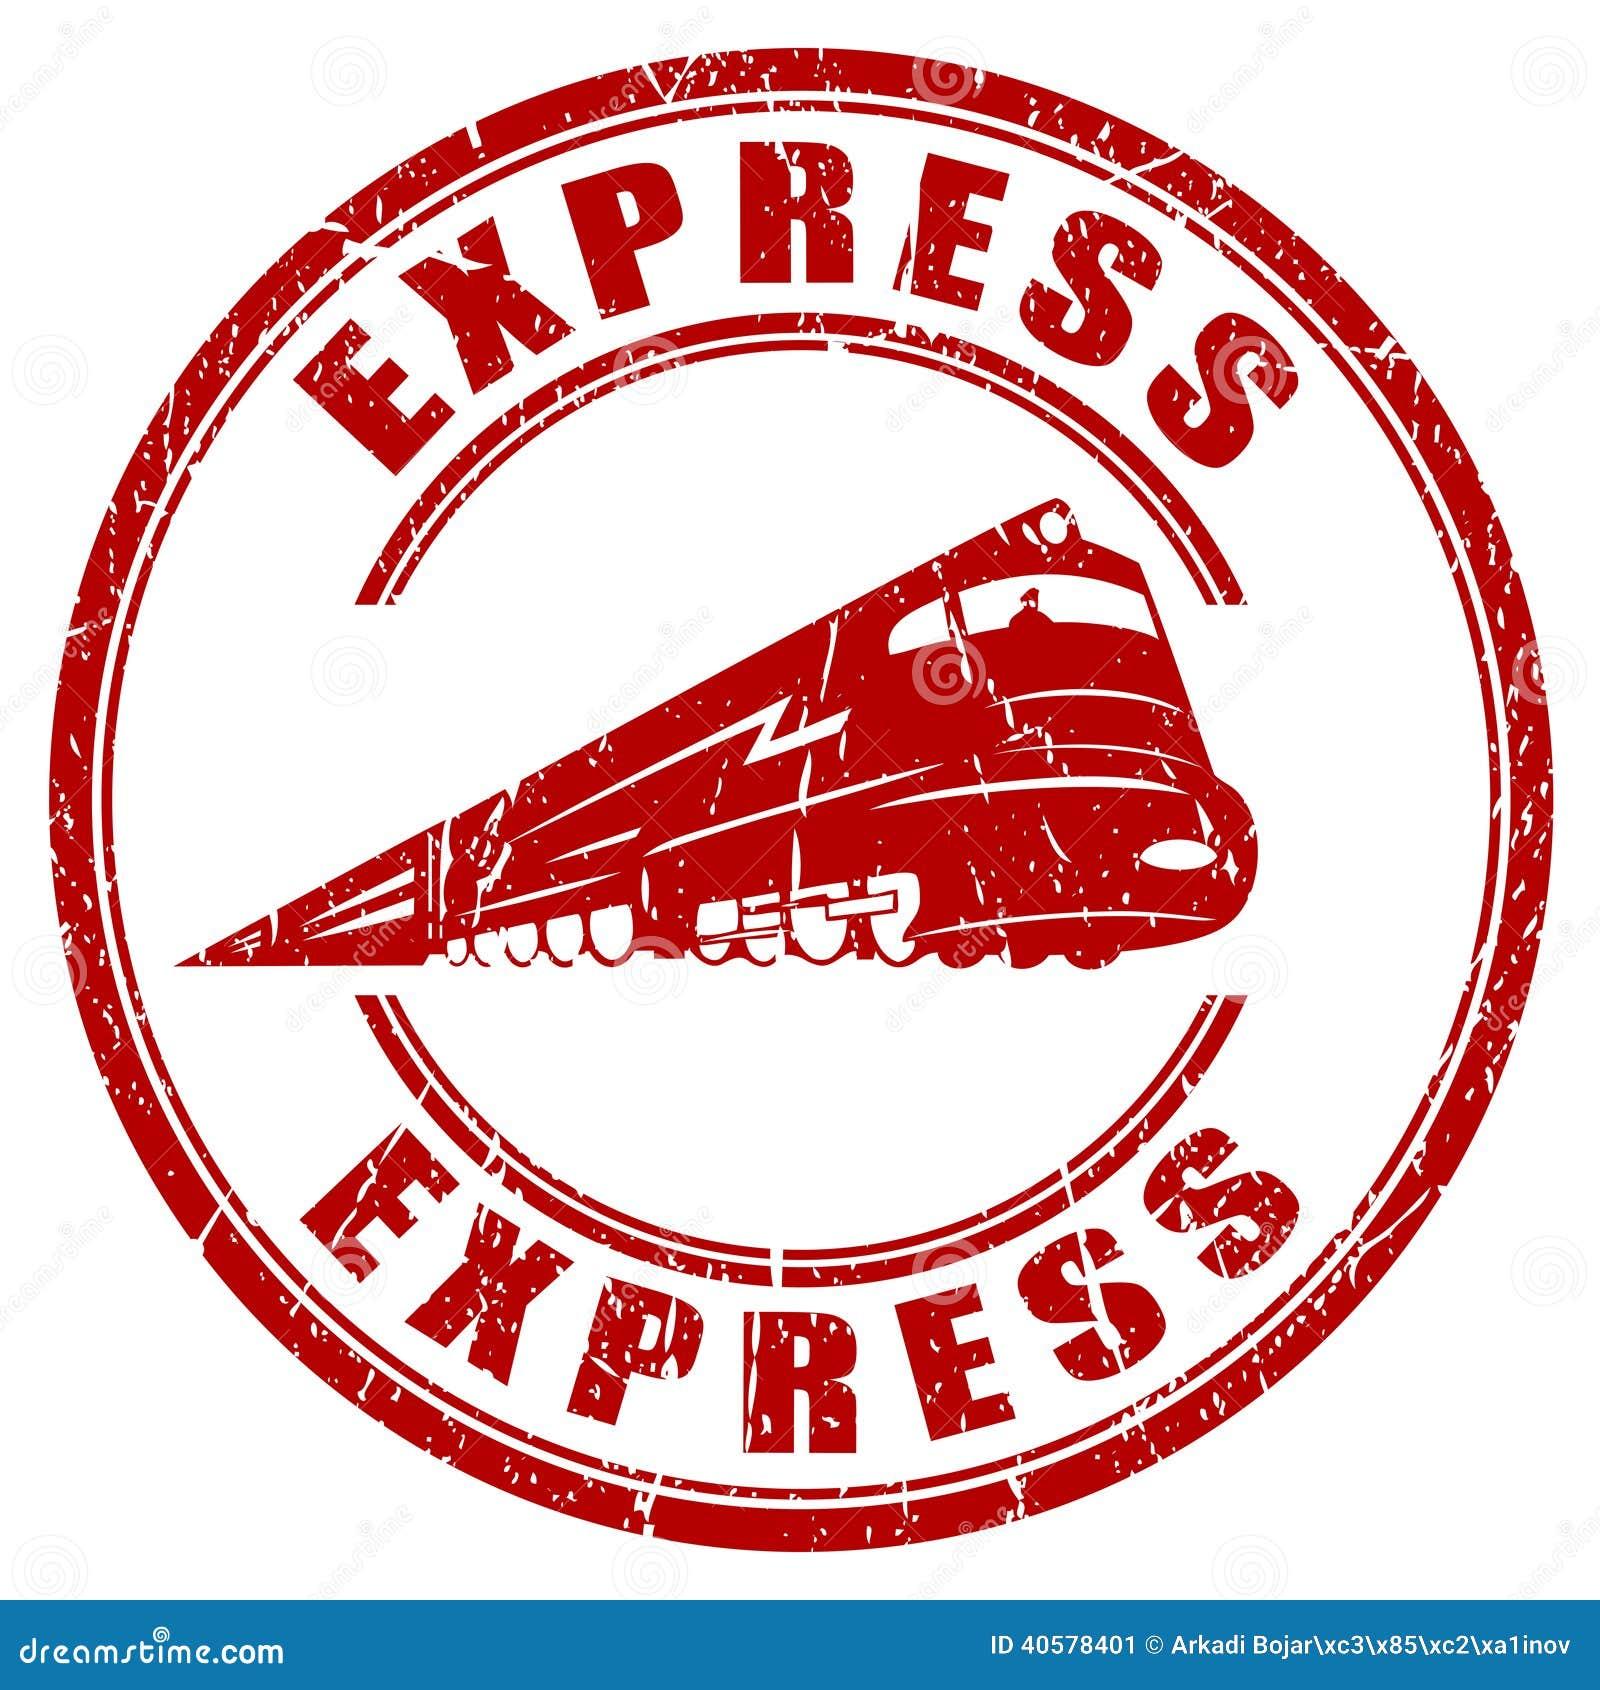 Express - Express Stamp Stock Image